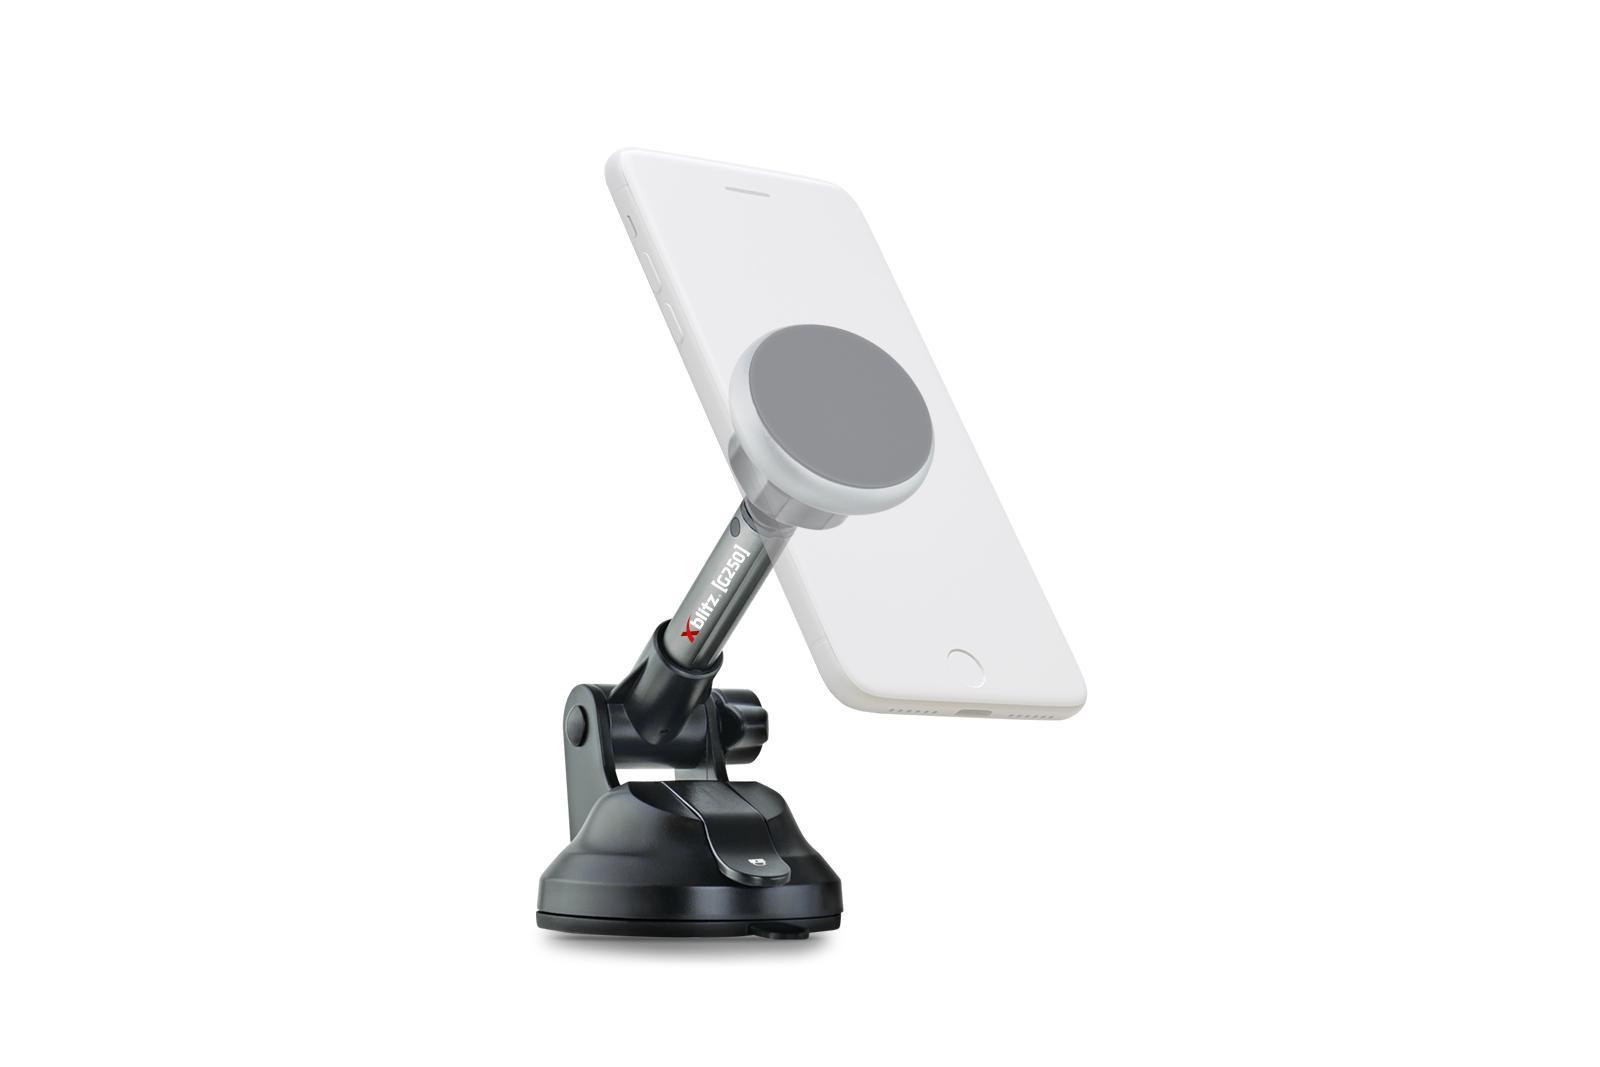 Mobile phone holders XBLITZ G250 expert knowledge